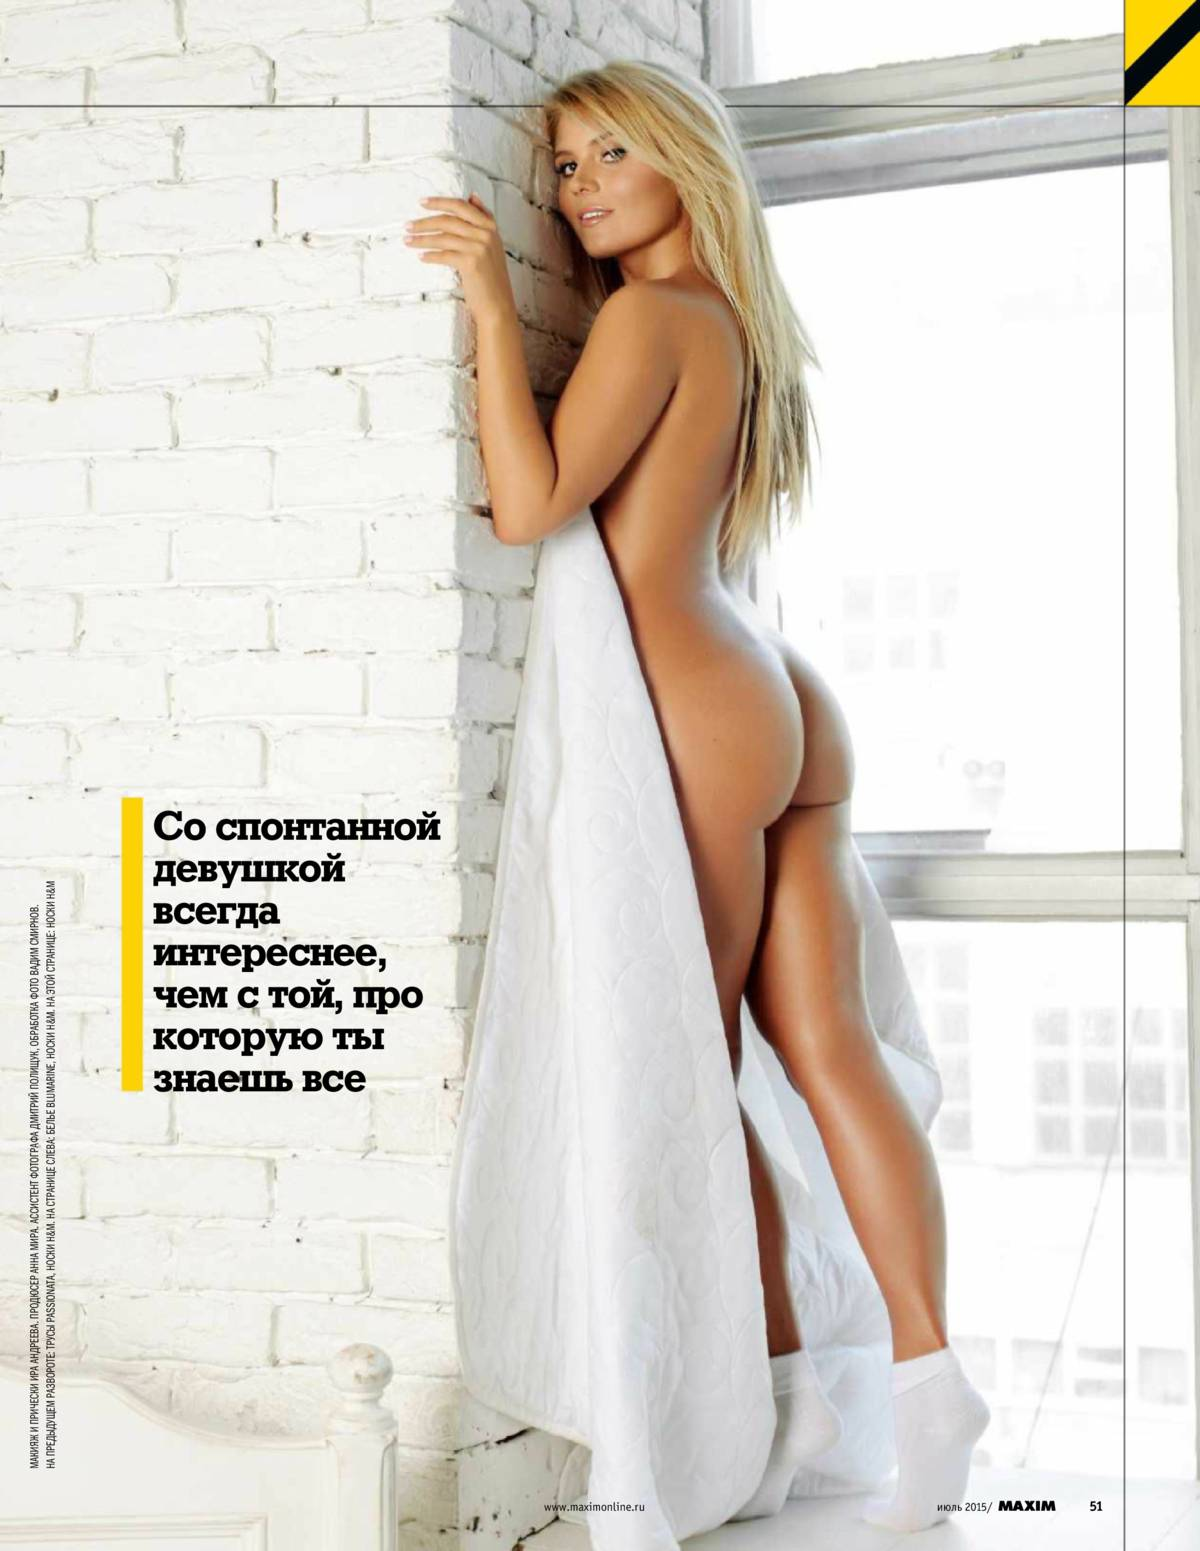 Anna Shulgina Sexy Photoshoot, Topless